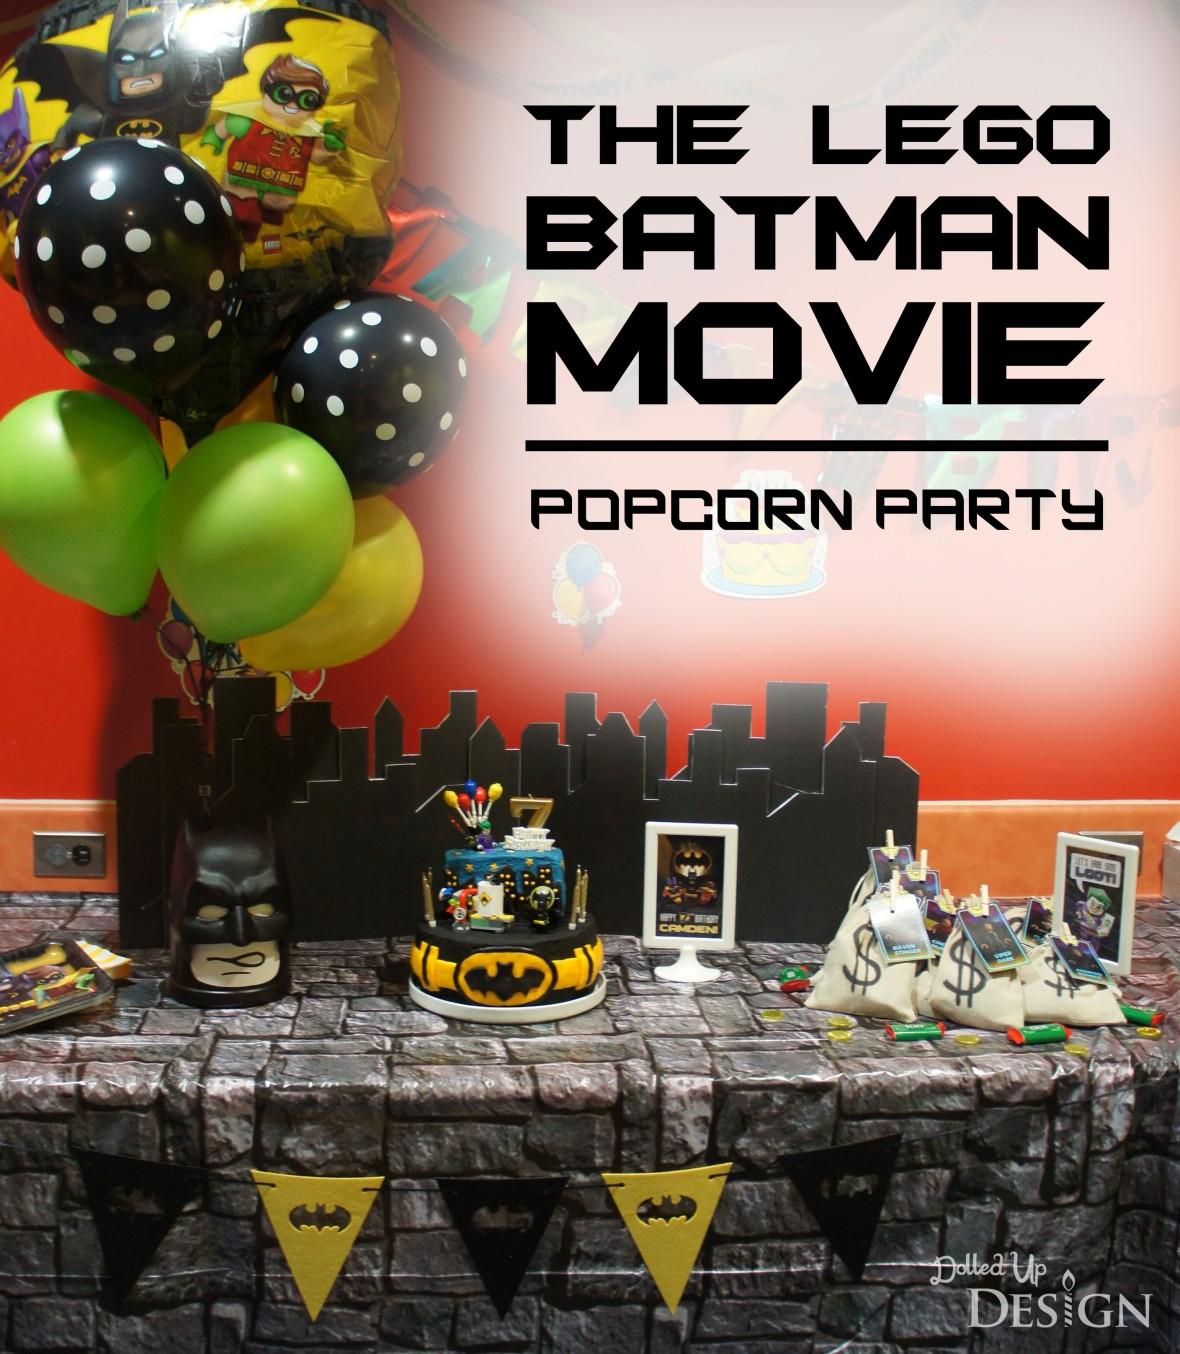 The Lego Batman Movie_Cineplex Popcorn Parties